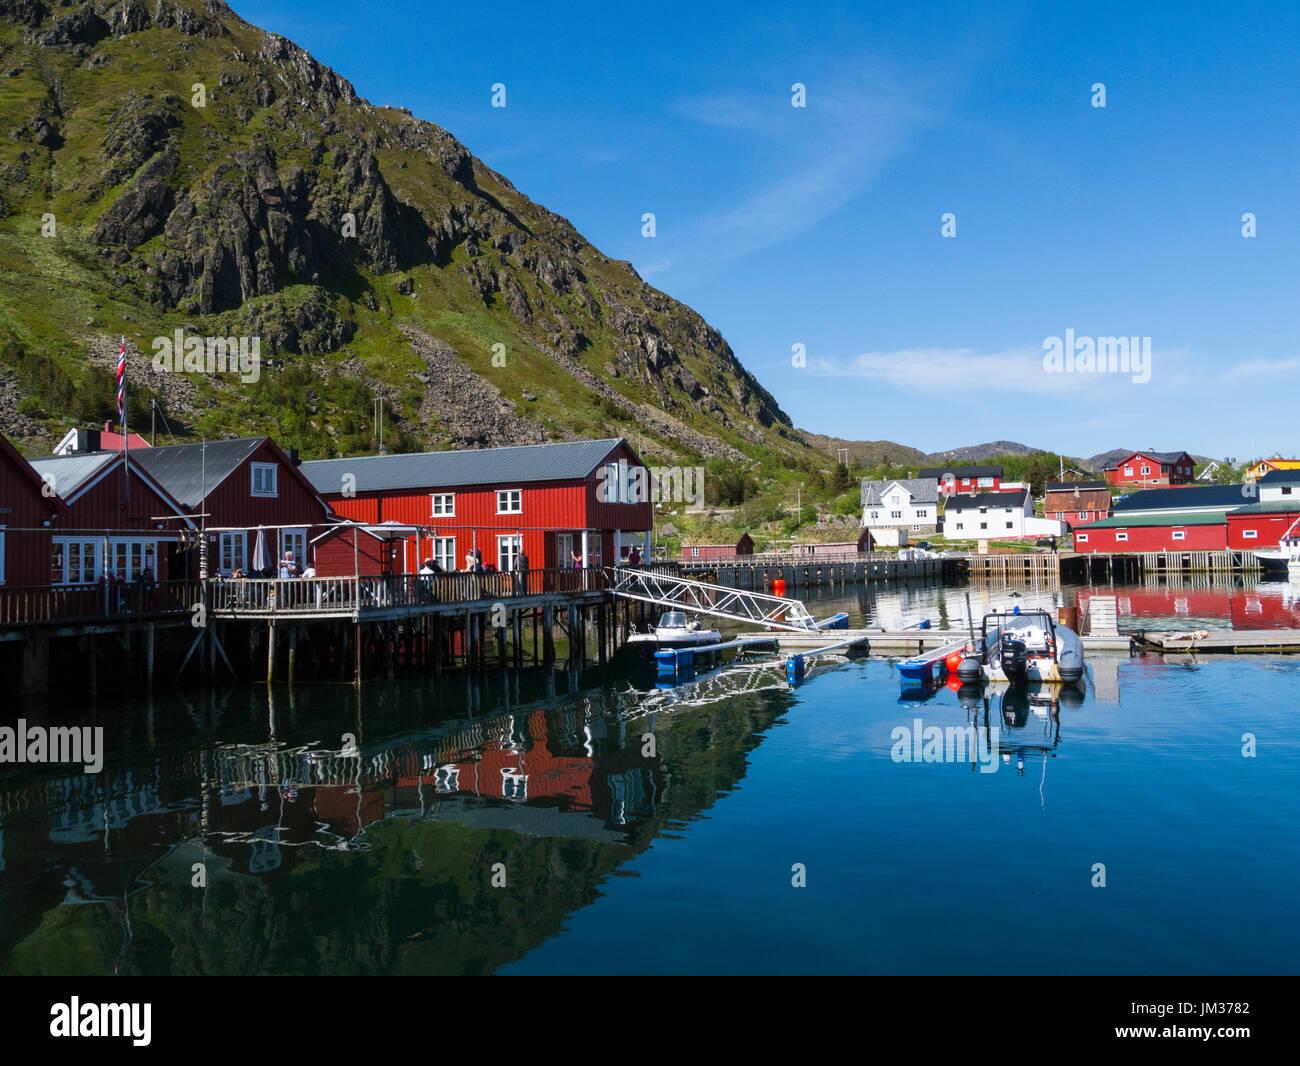 Kraemmervika Havn Ballstad village in the municipality of Vestvågøy Lofoten archipelago Norway one of largest fishing villages of Lofoten - Stock Image